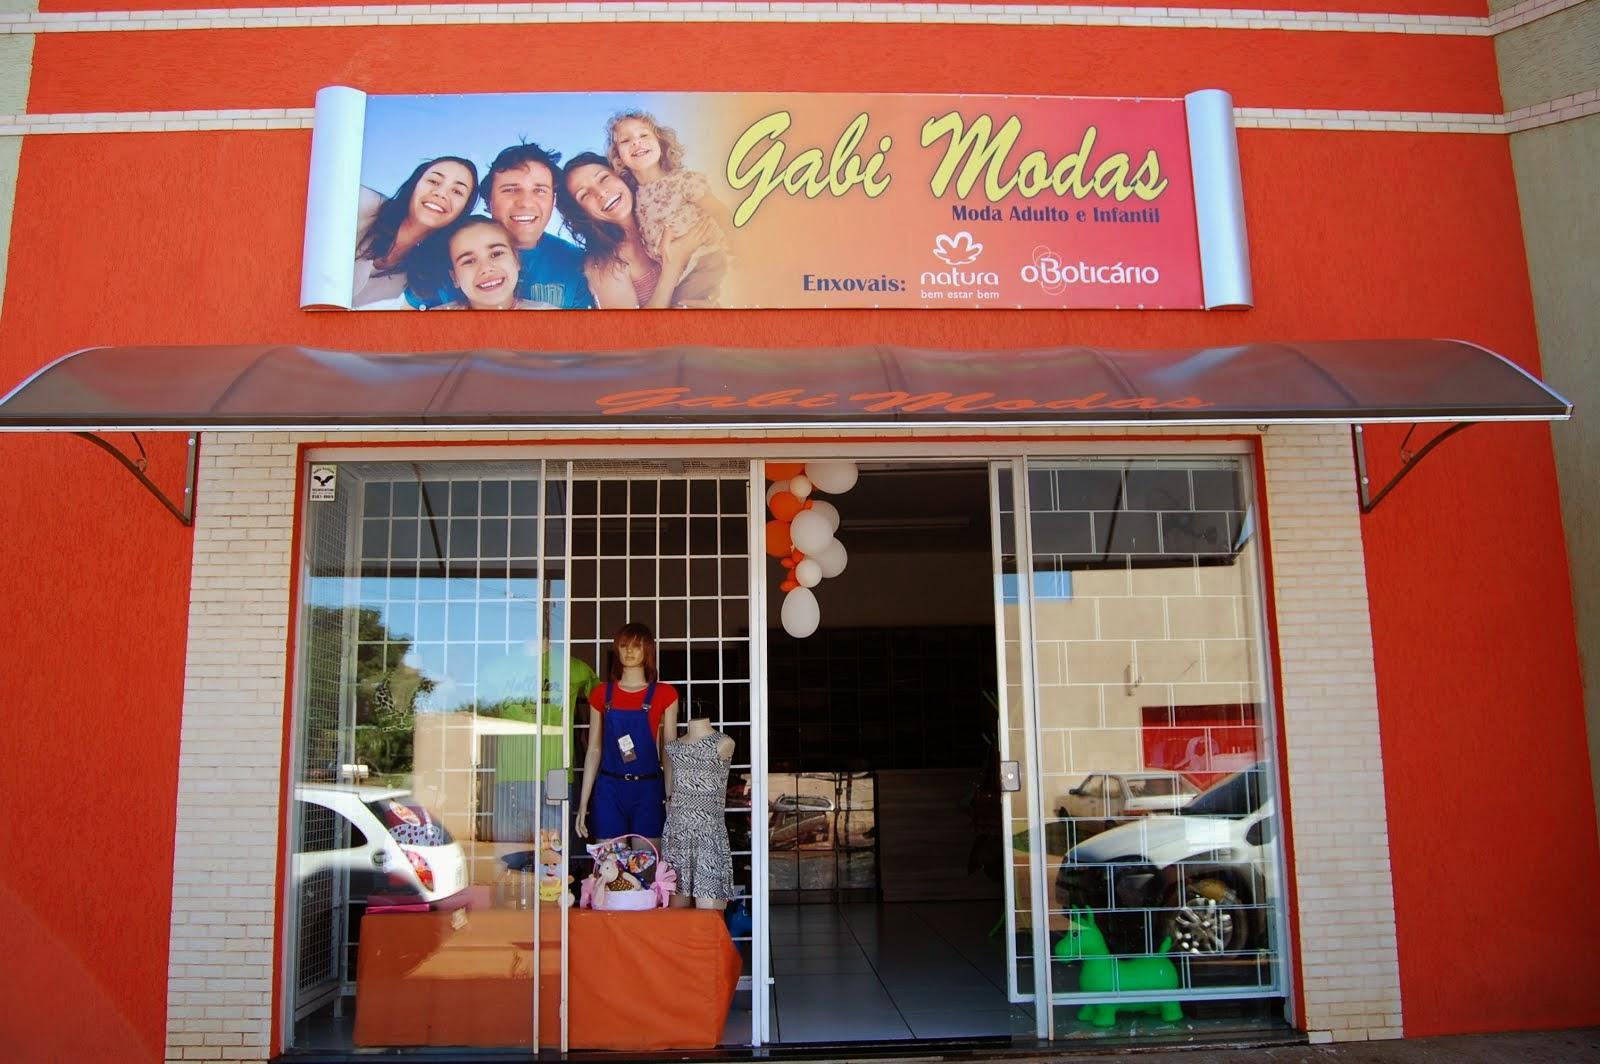 GABI MODAS